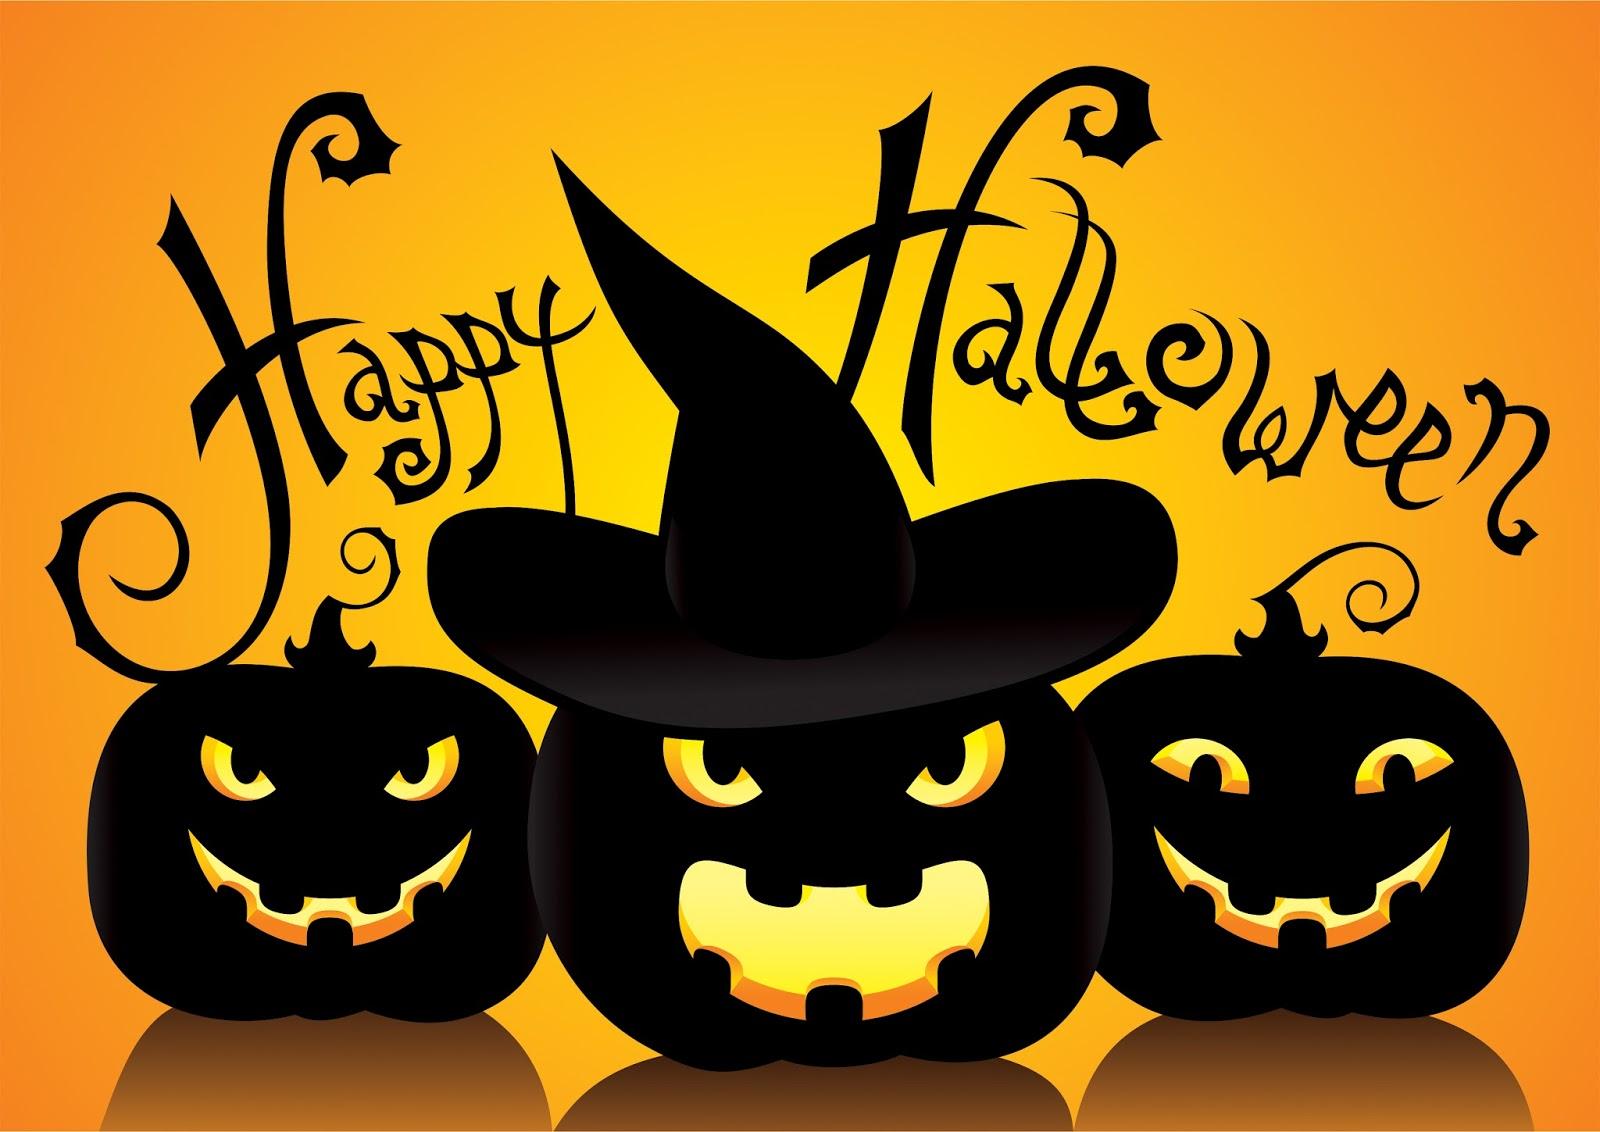 Happy halloween images m4hsunfo